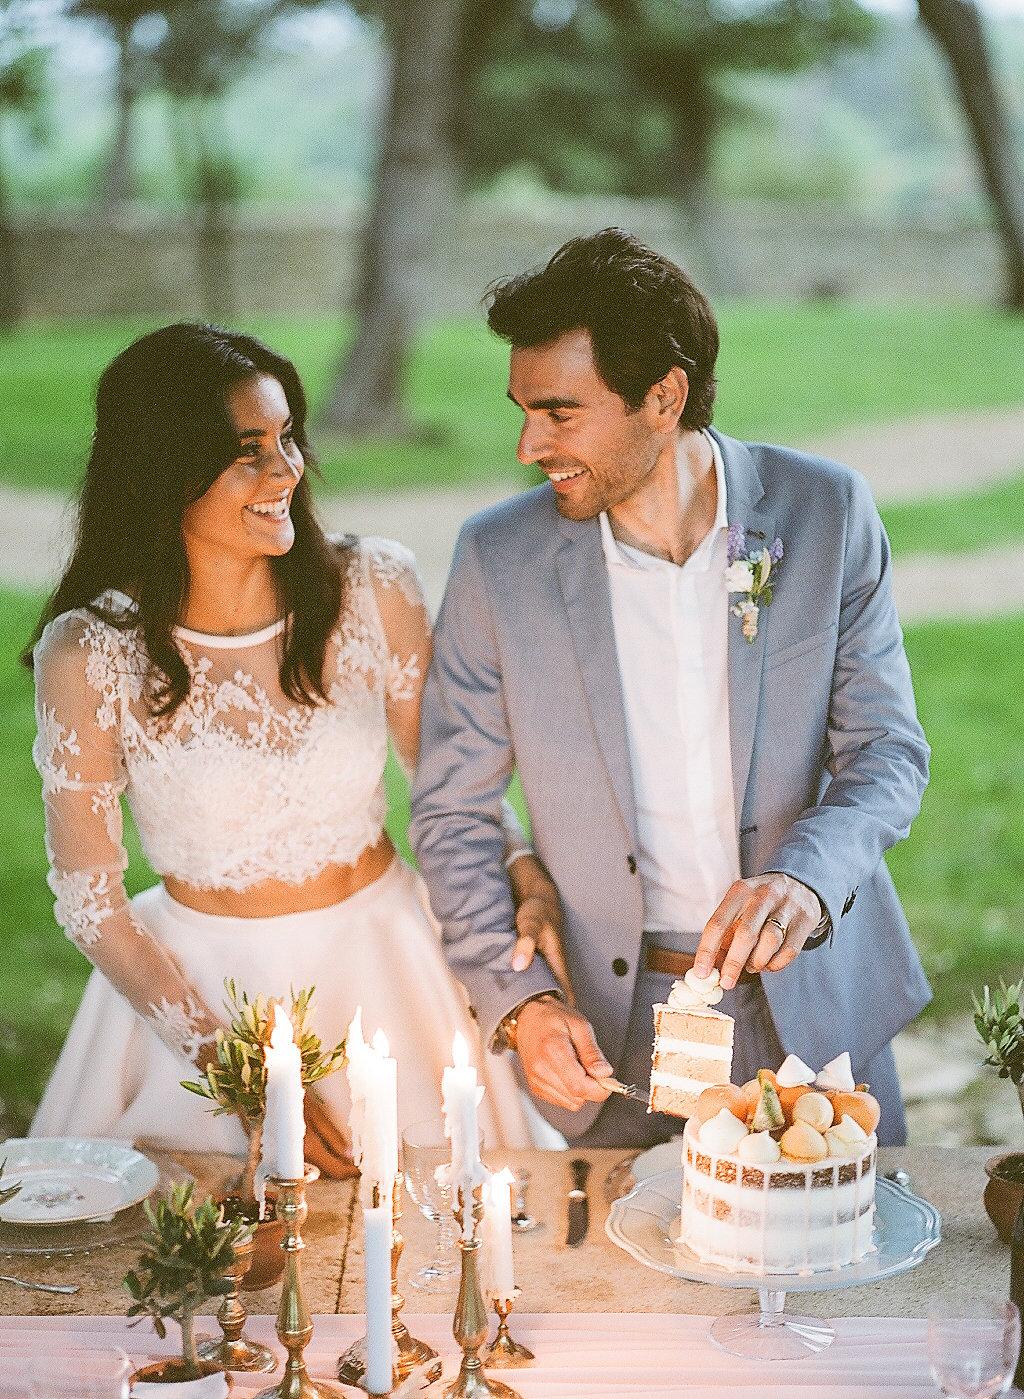 le coeur dans les etoiles - wedding planner - provence - luberon - alpilles - drome - vaucluse - sardaigne - italie - organisation - mariage - shooting - dolce vita - valery villard-461